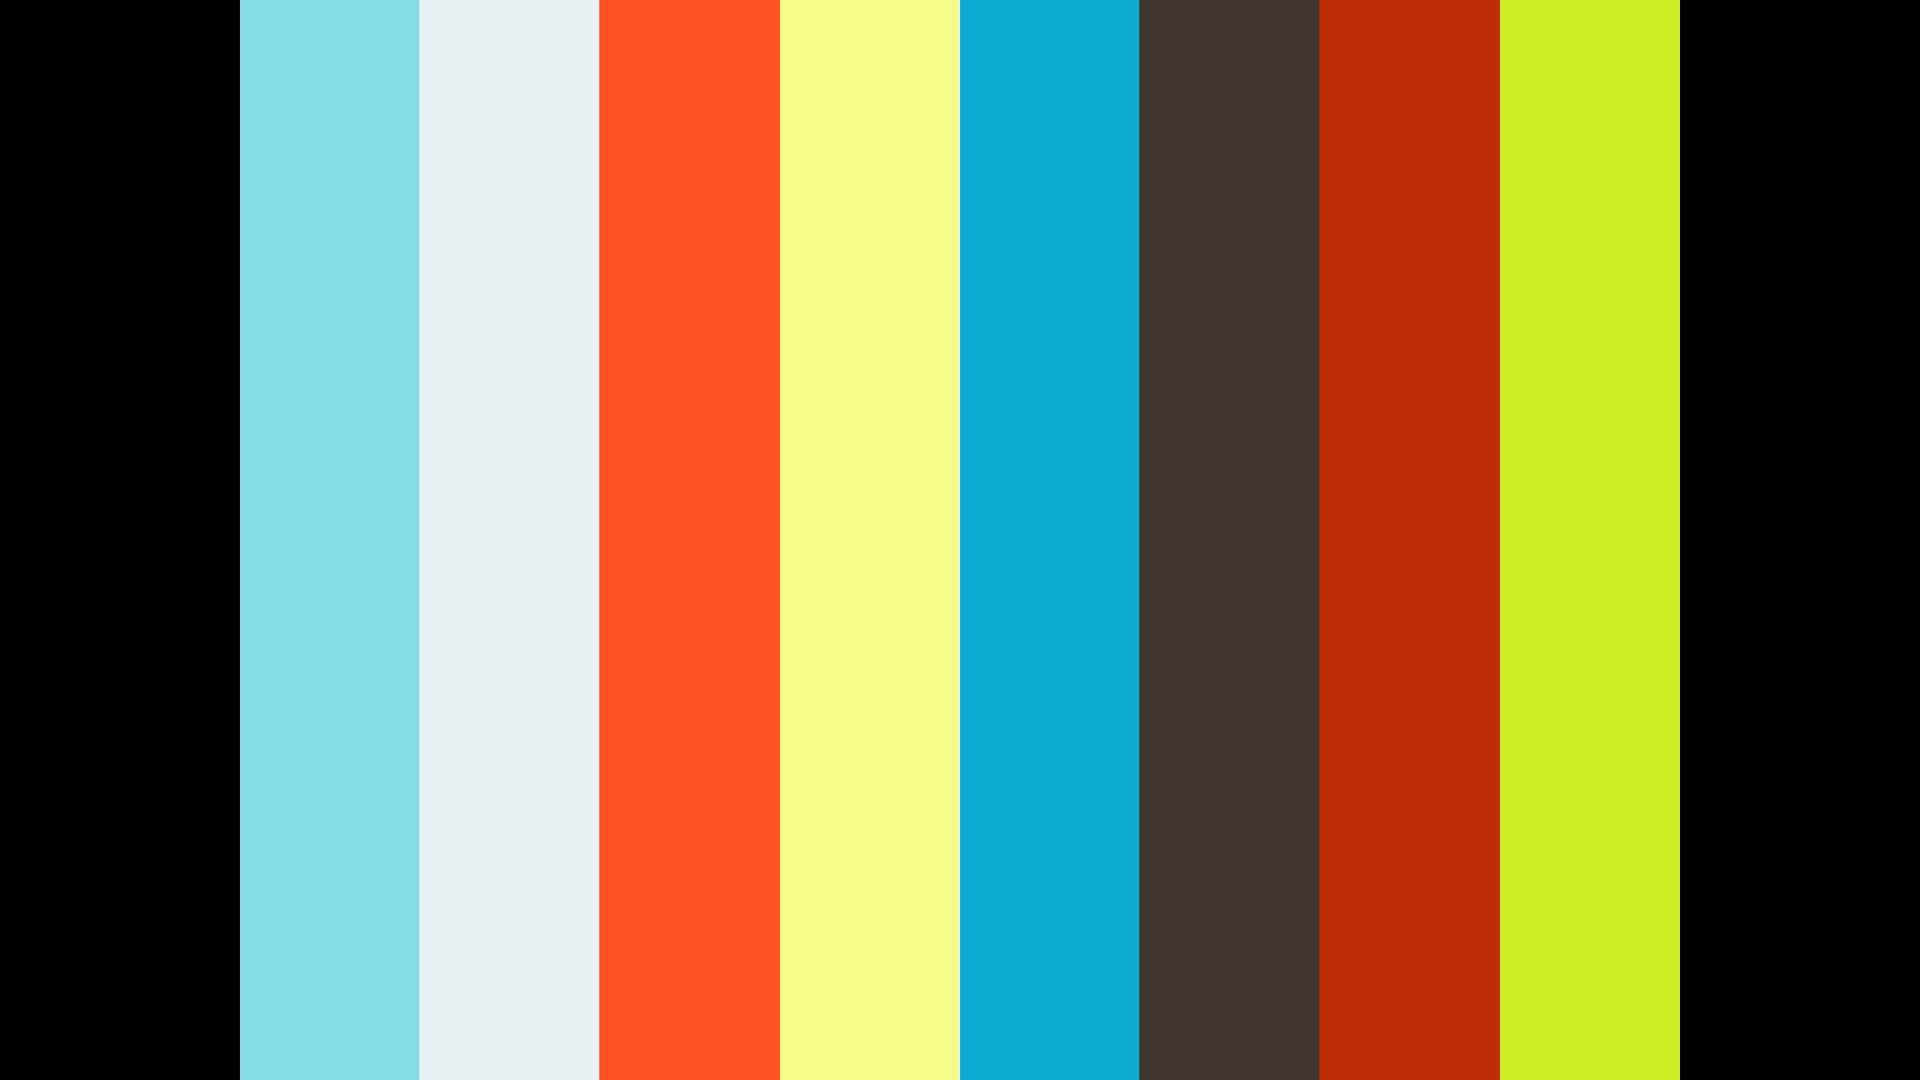 wellevateSM - Dashboard Overview